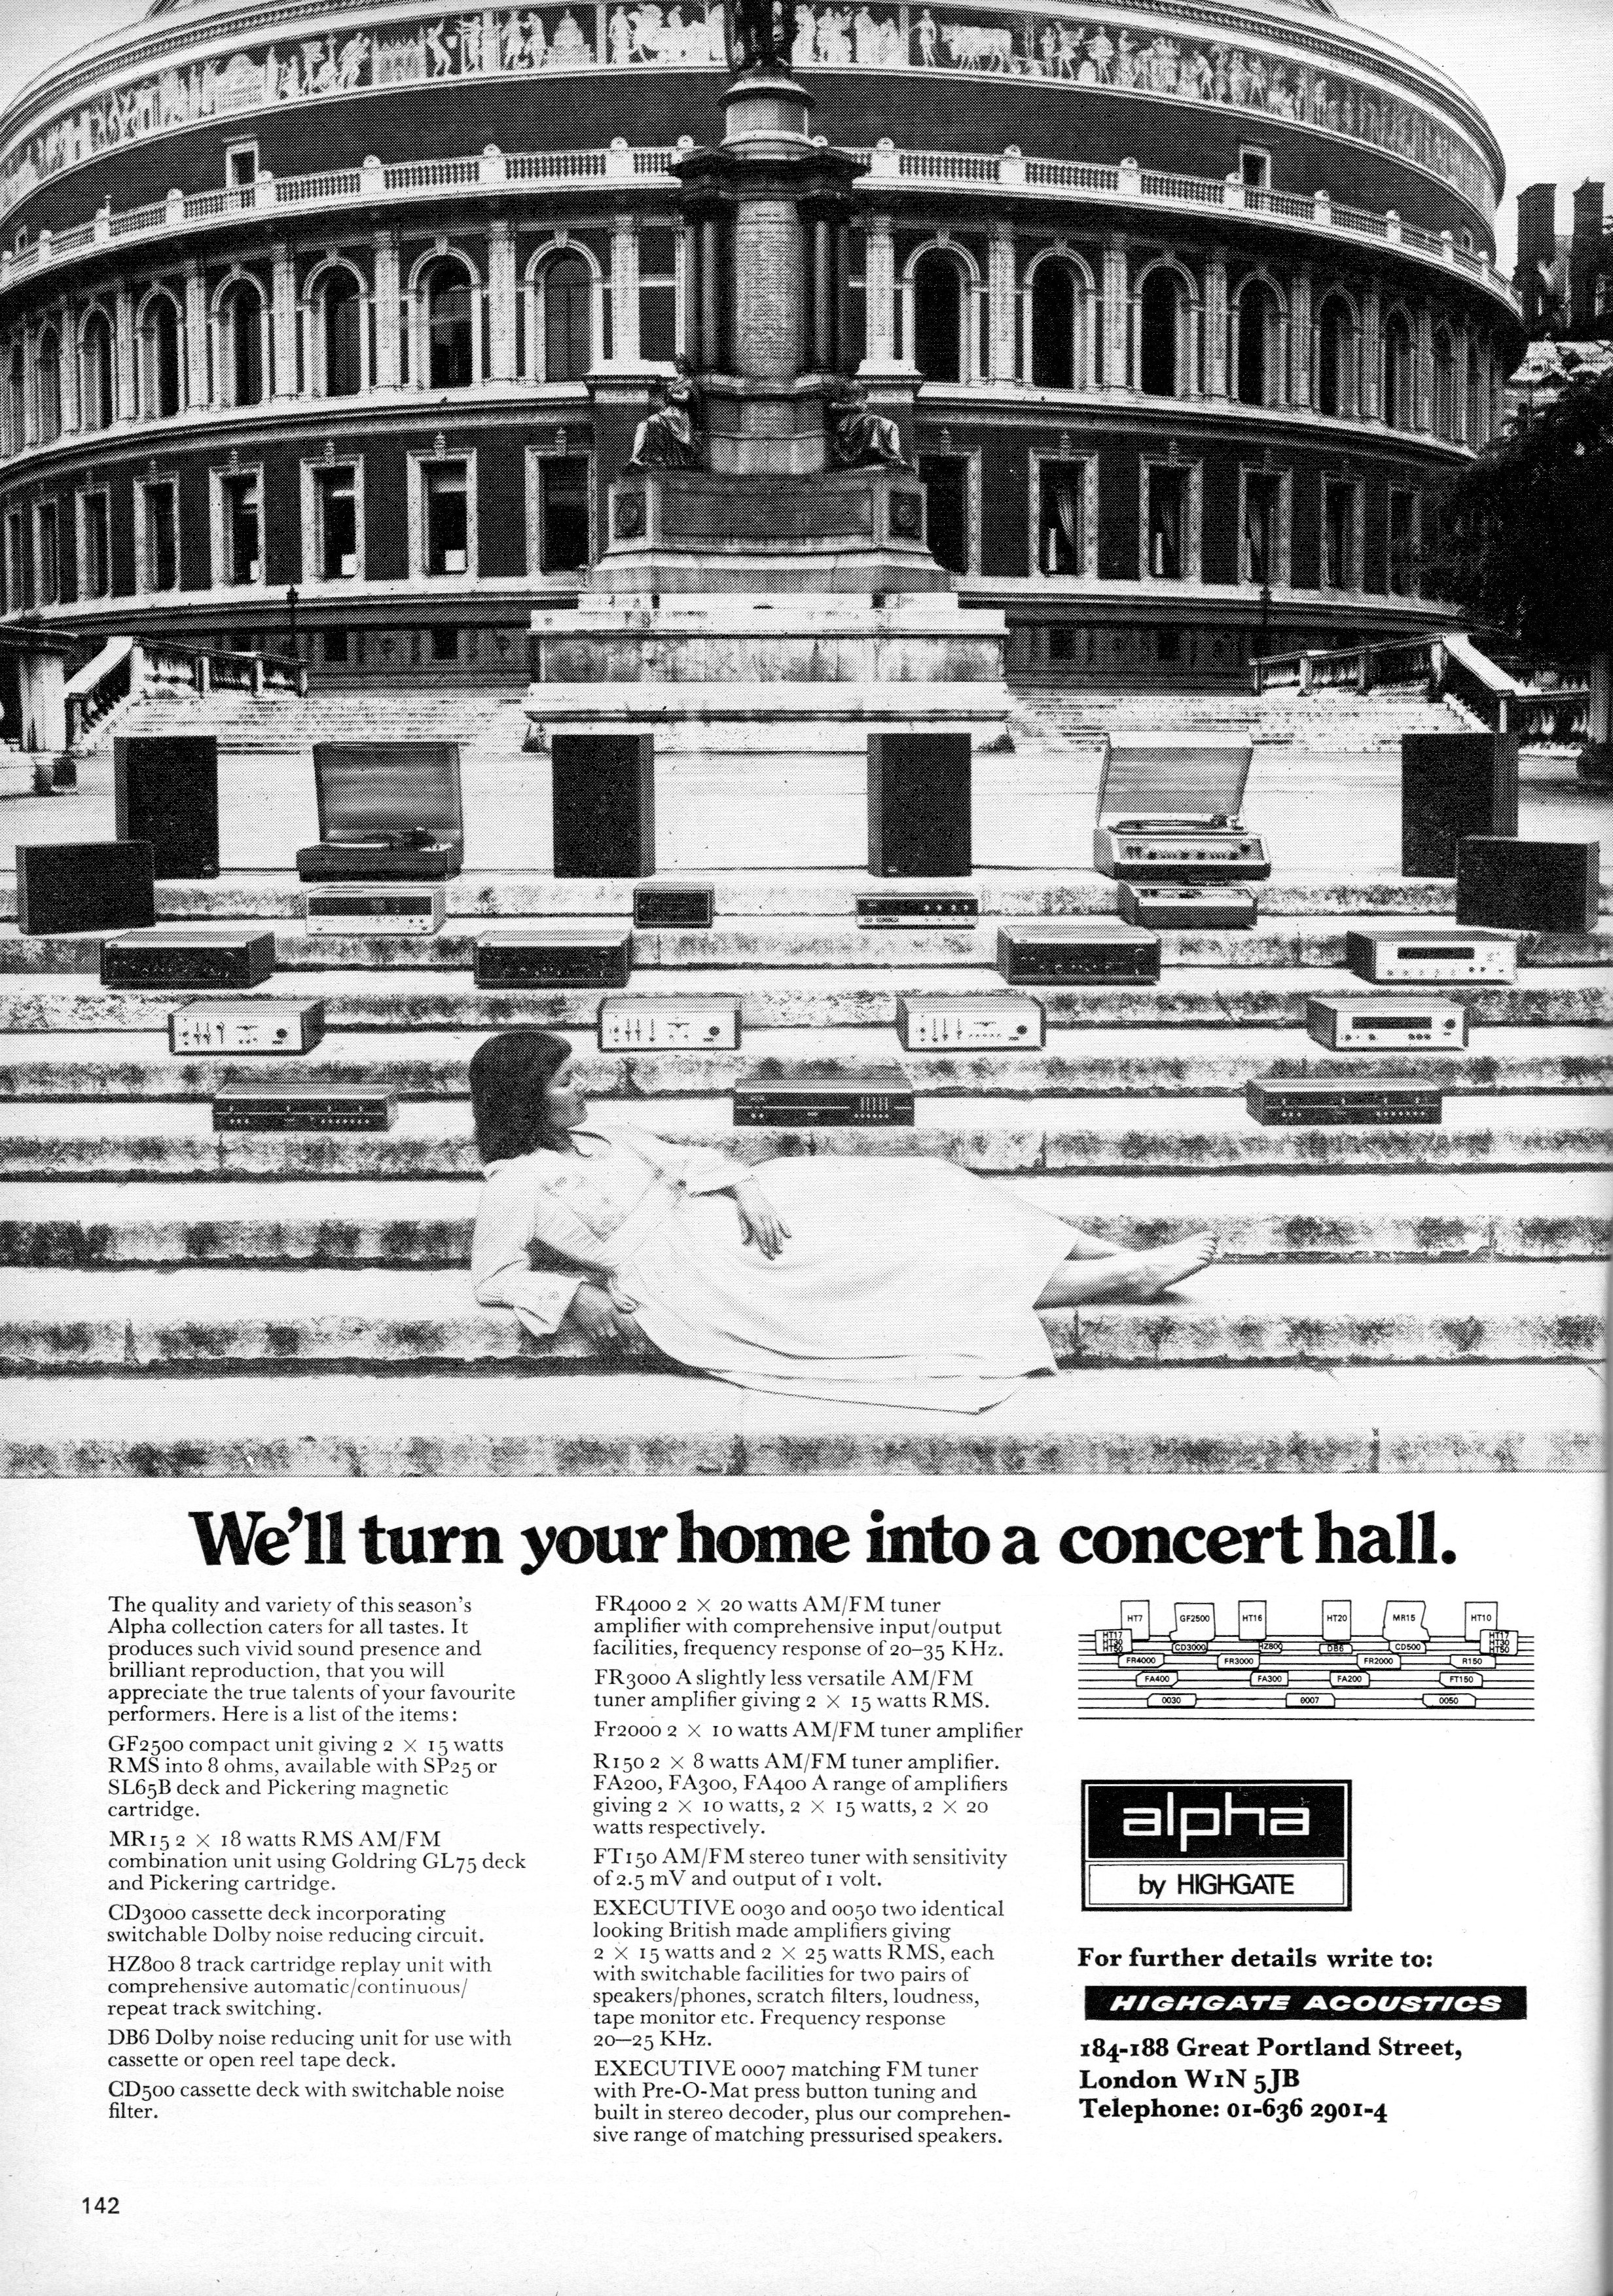 Alpha Advert 1972.jpg